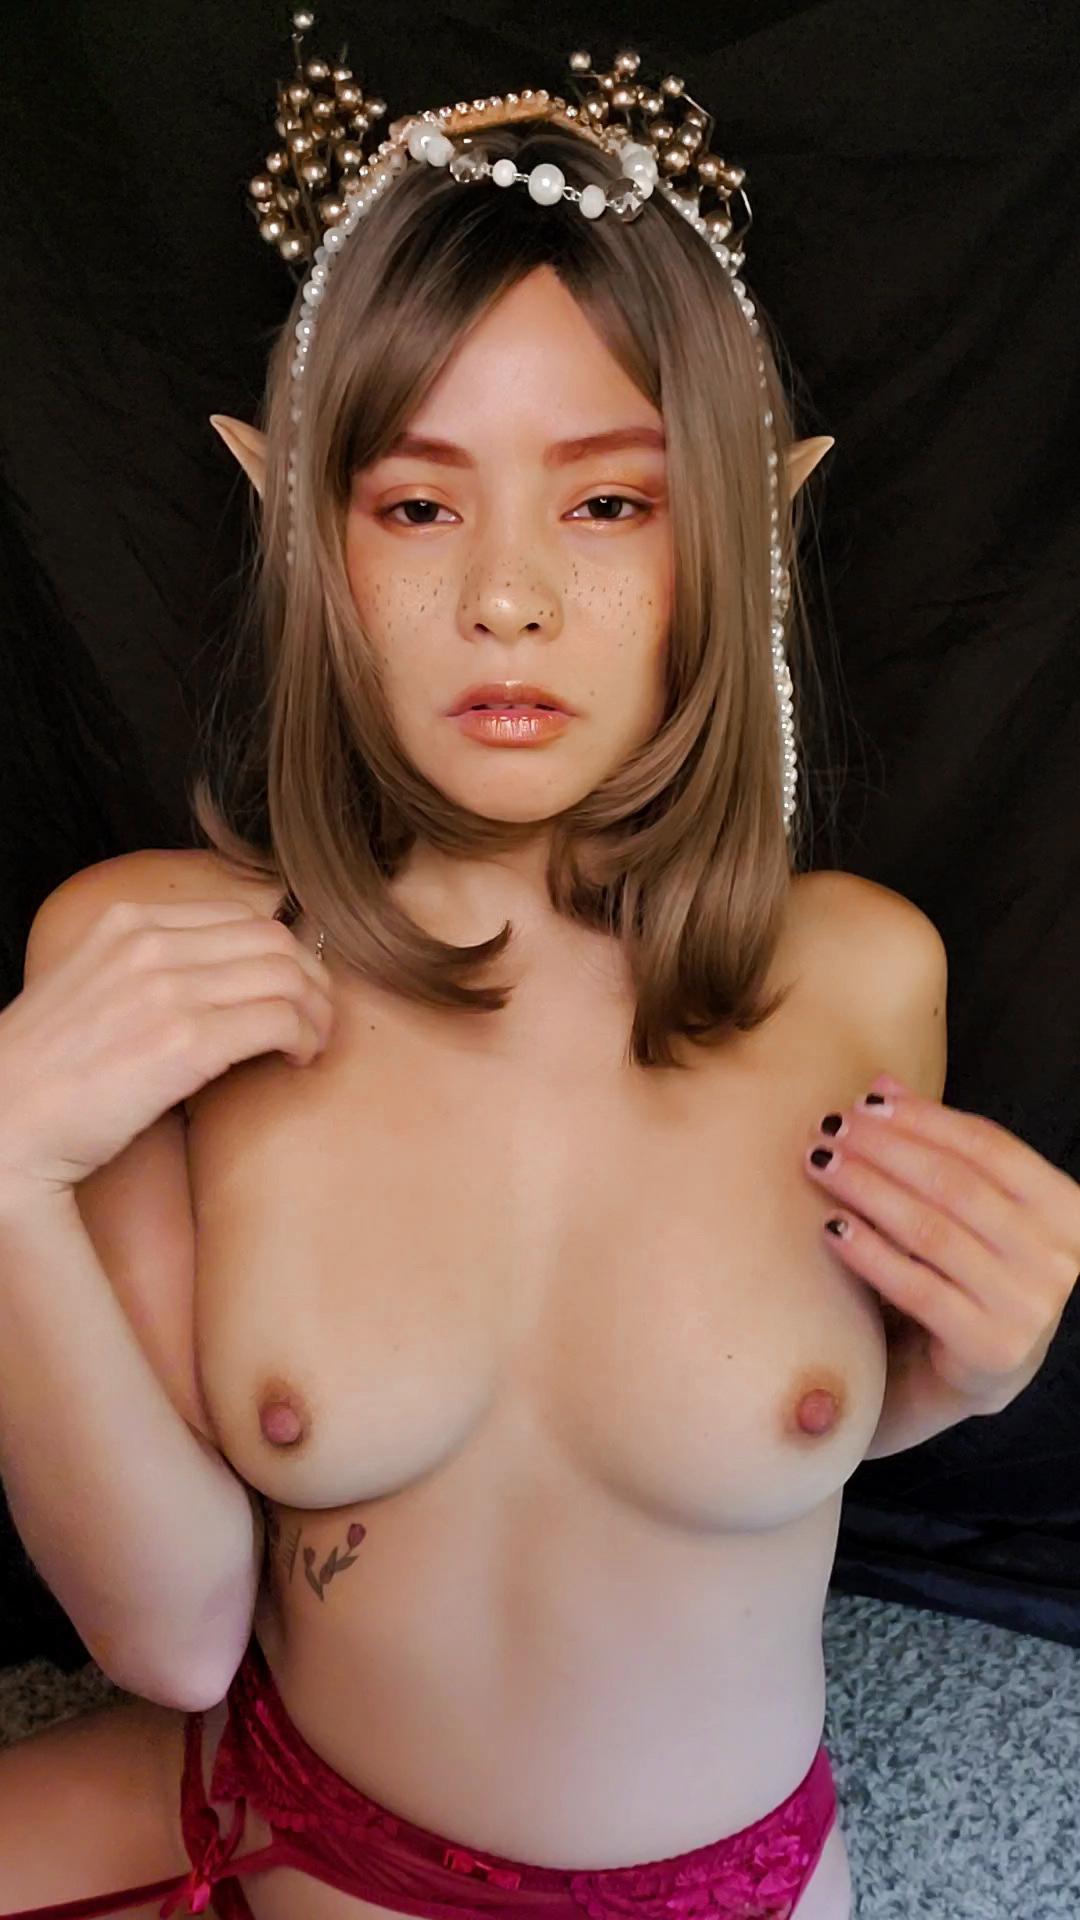 Nymph Boobies